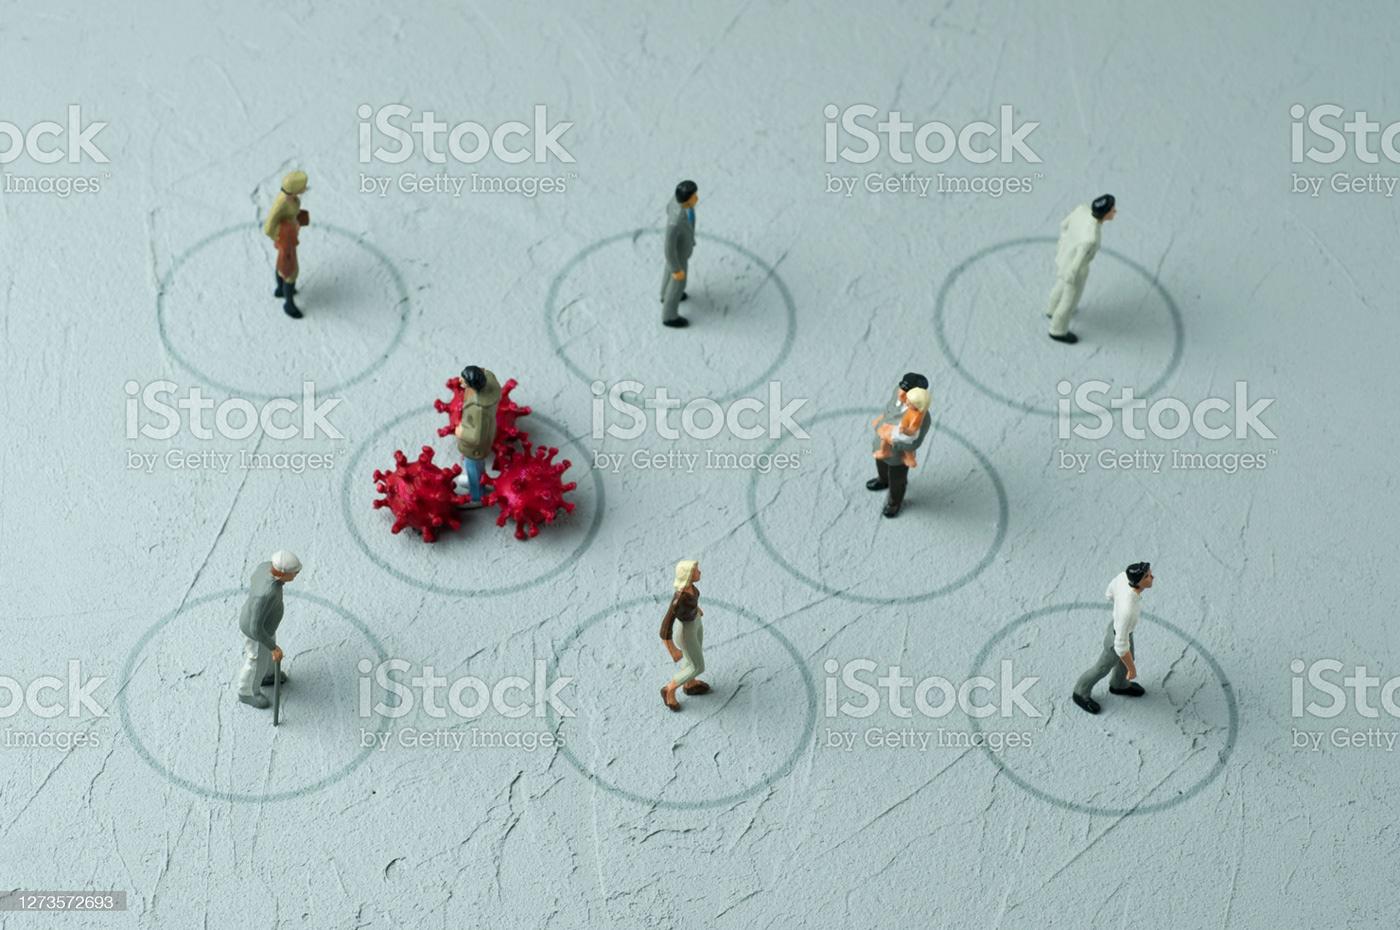 concepts Coronavirus COVID-19 epidemic fear figurine Health lockdown new normal people